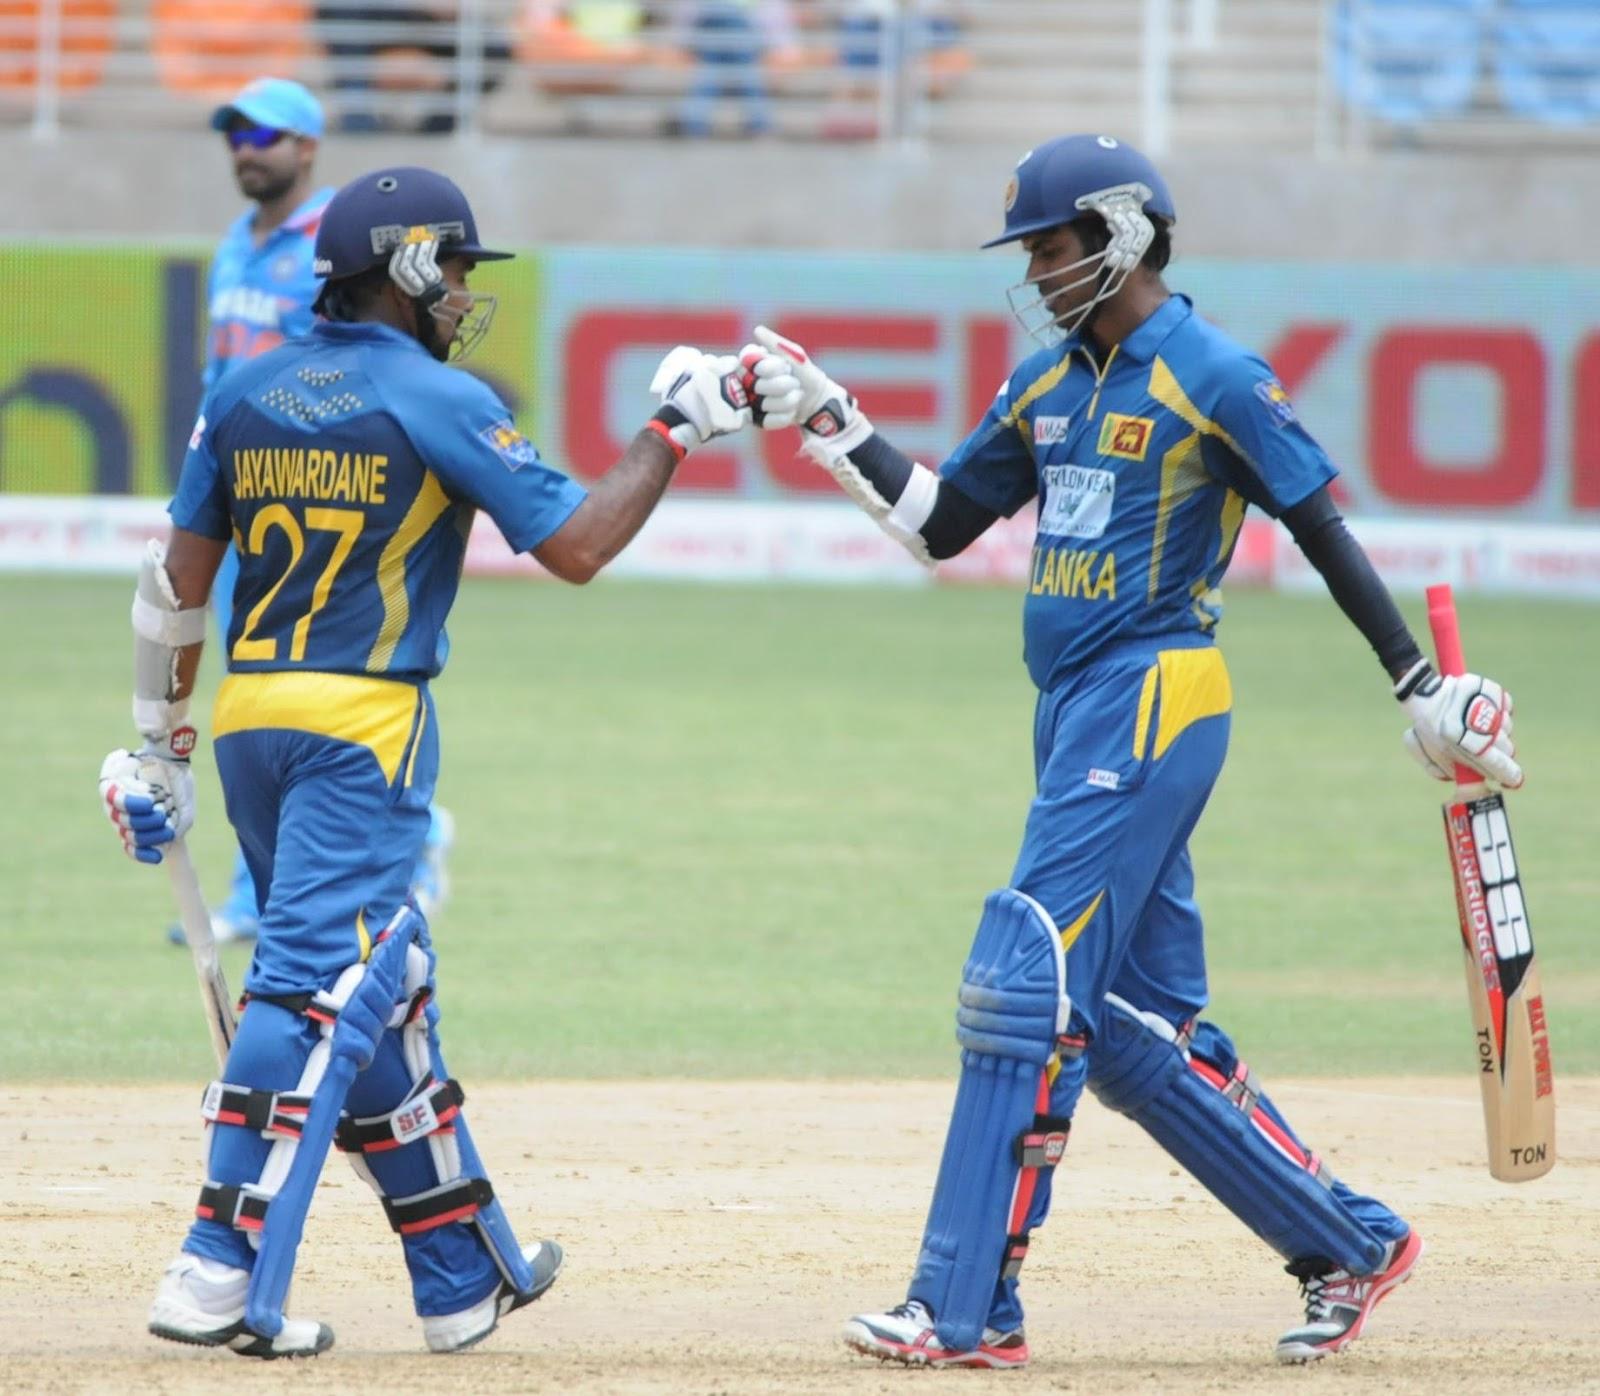 Upul-Tharanga-Mahela-Jayawardene-India-vs-Srilanka-Tri-Series-2013